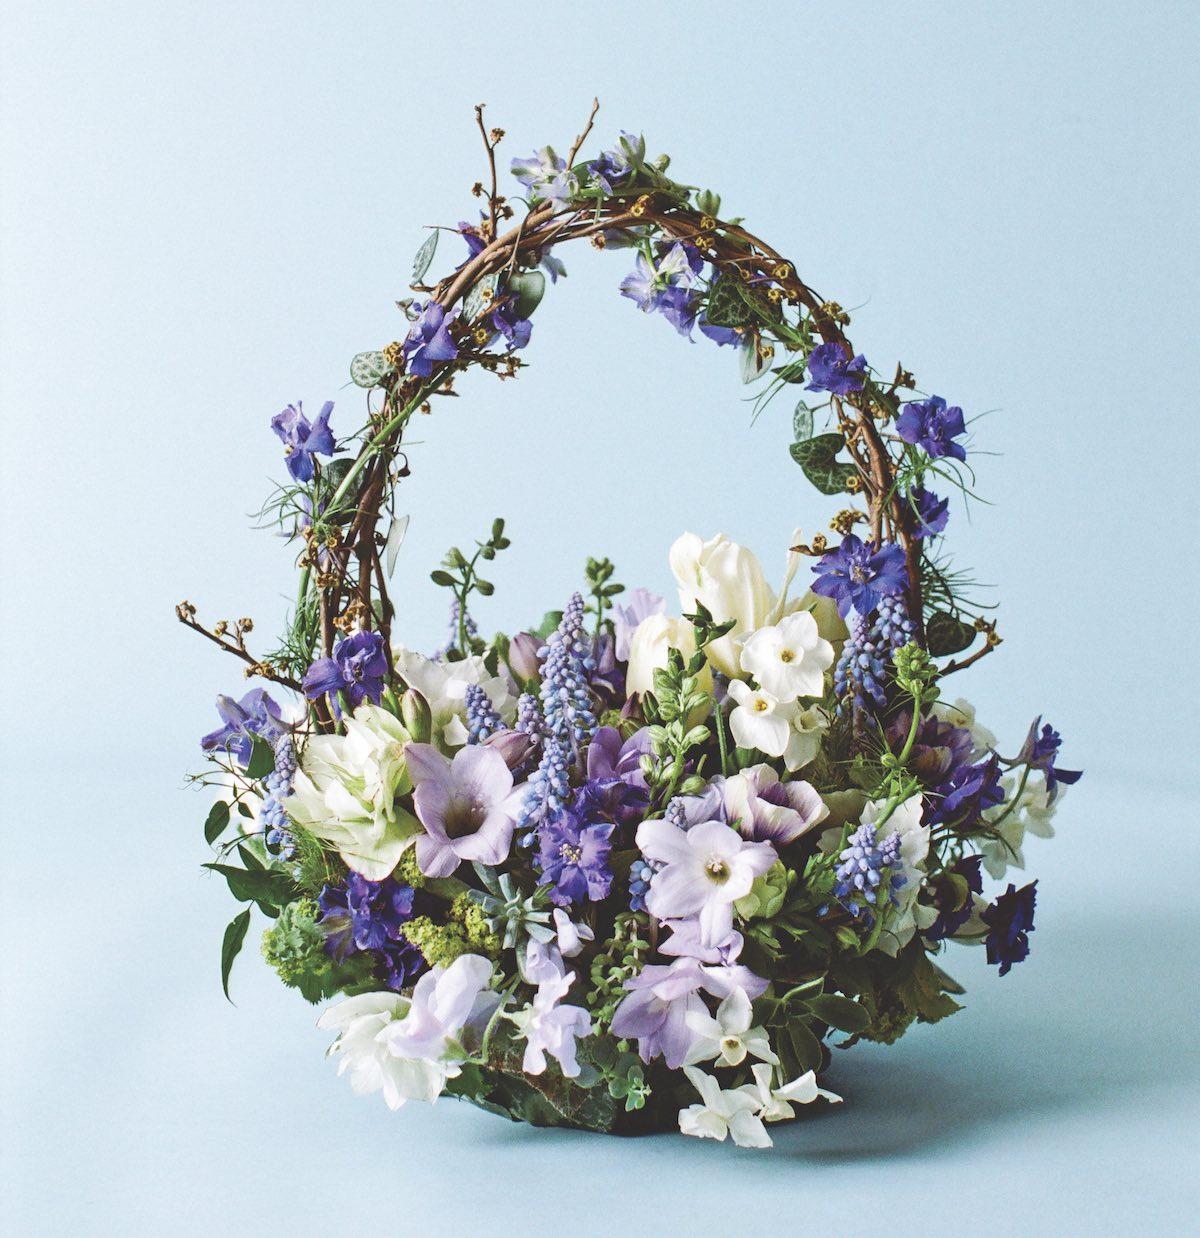 A tisket a tasket flowers in a basket flower magazine basket arrangements basket flower arrangements izmirmasajfo